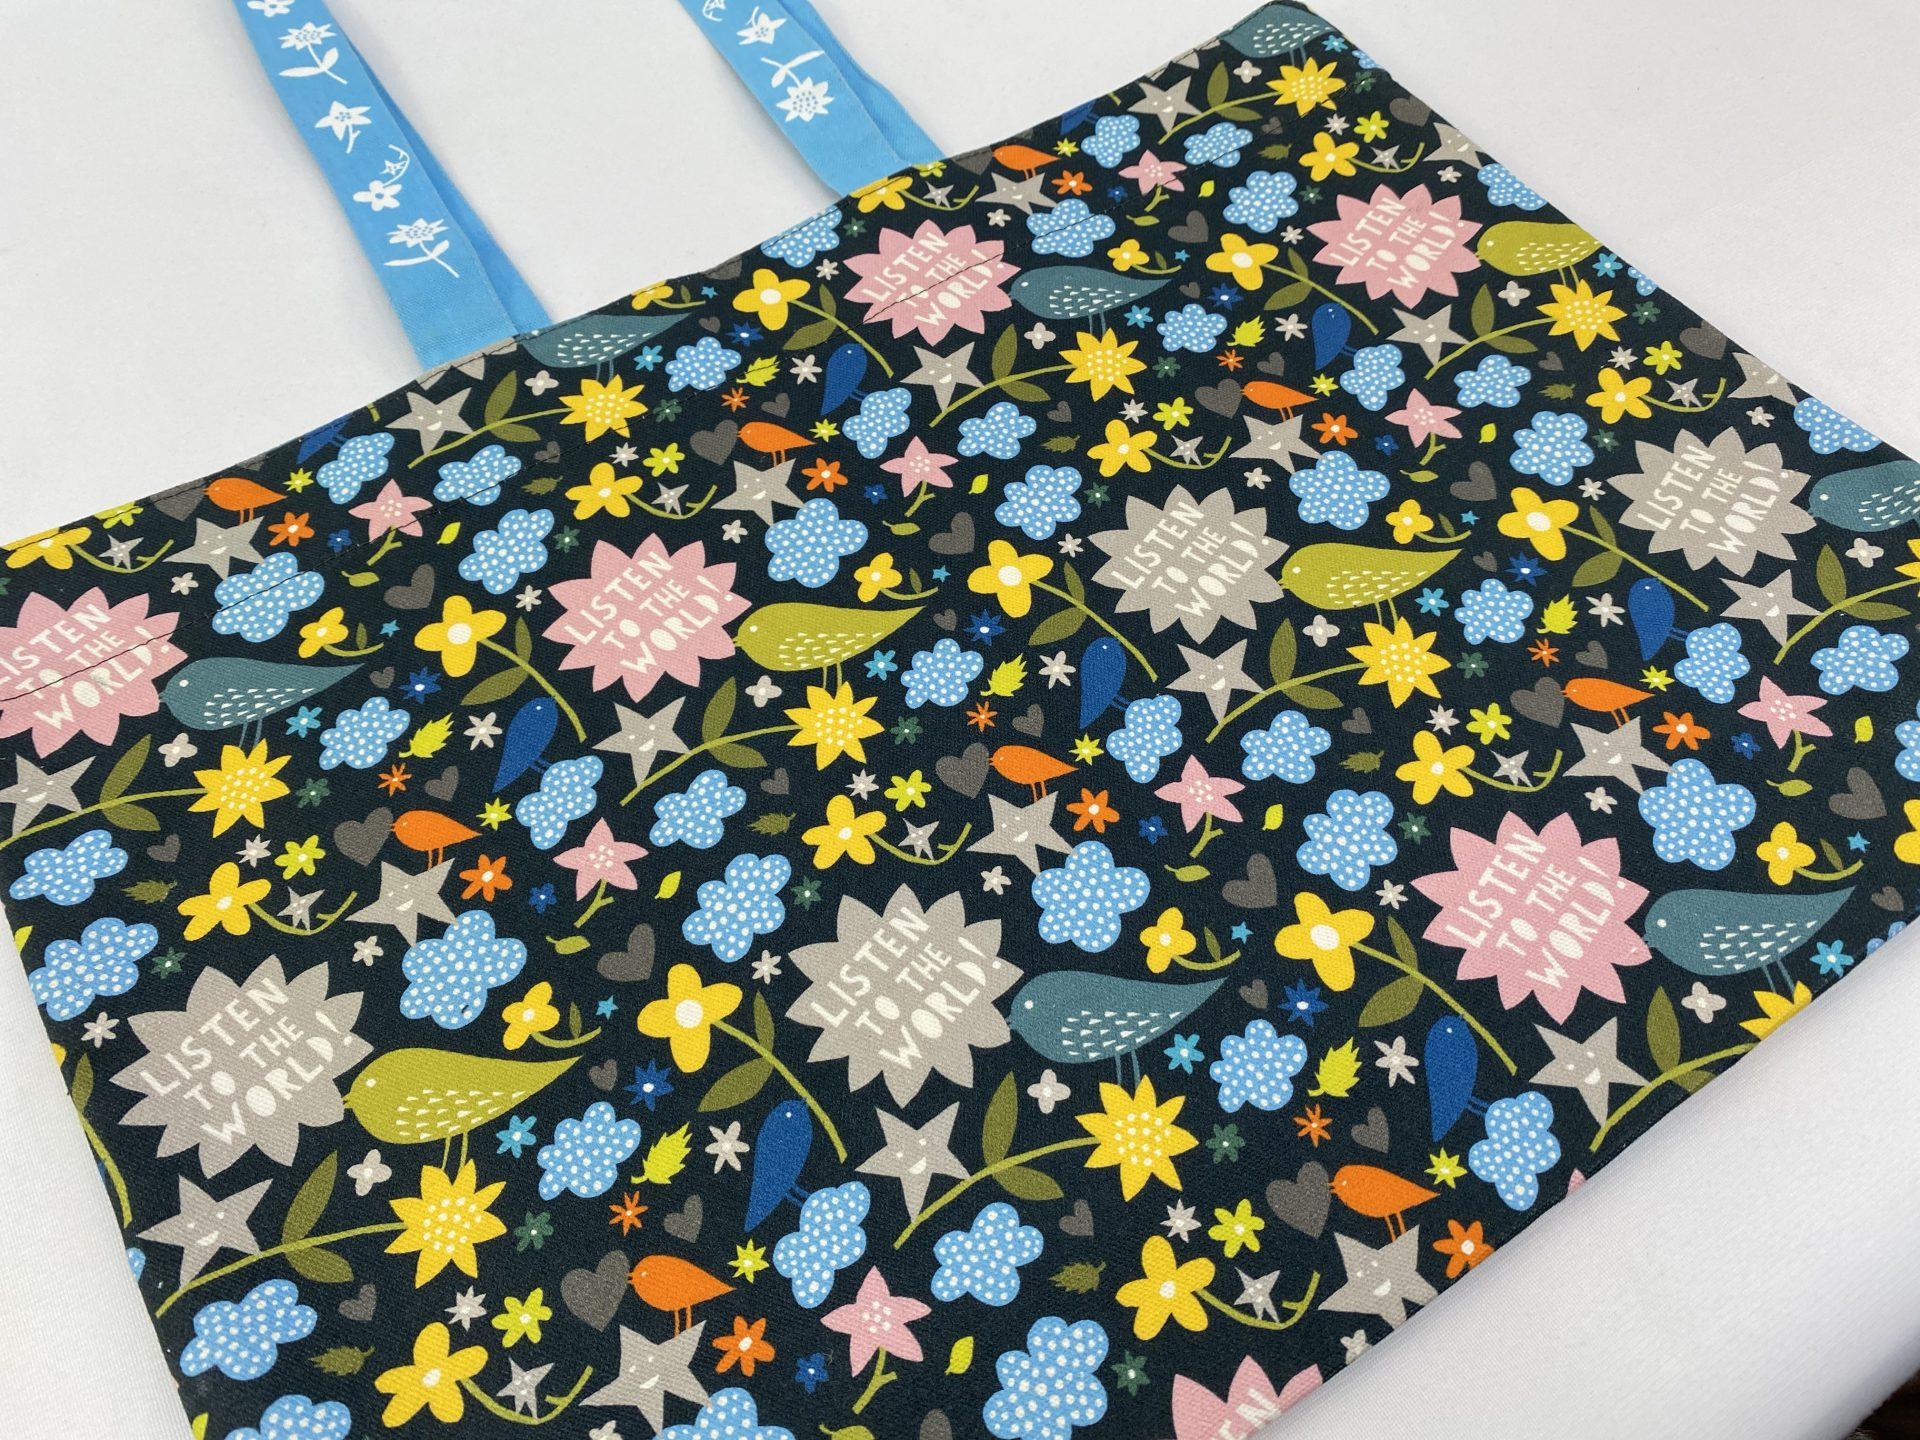 YSP Rob Ryan Listewn to the World printed textile bag